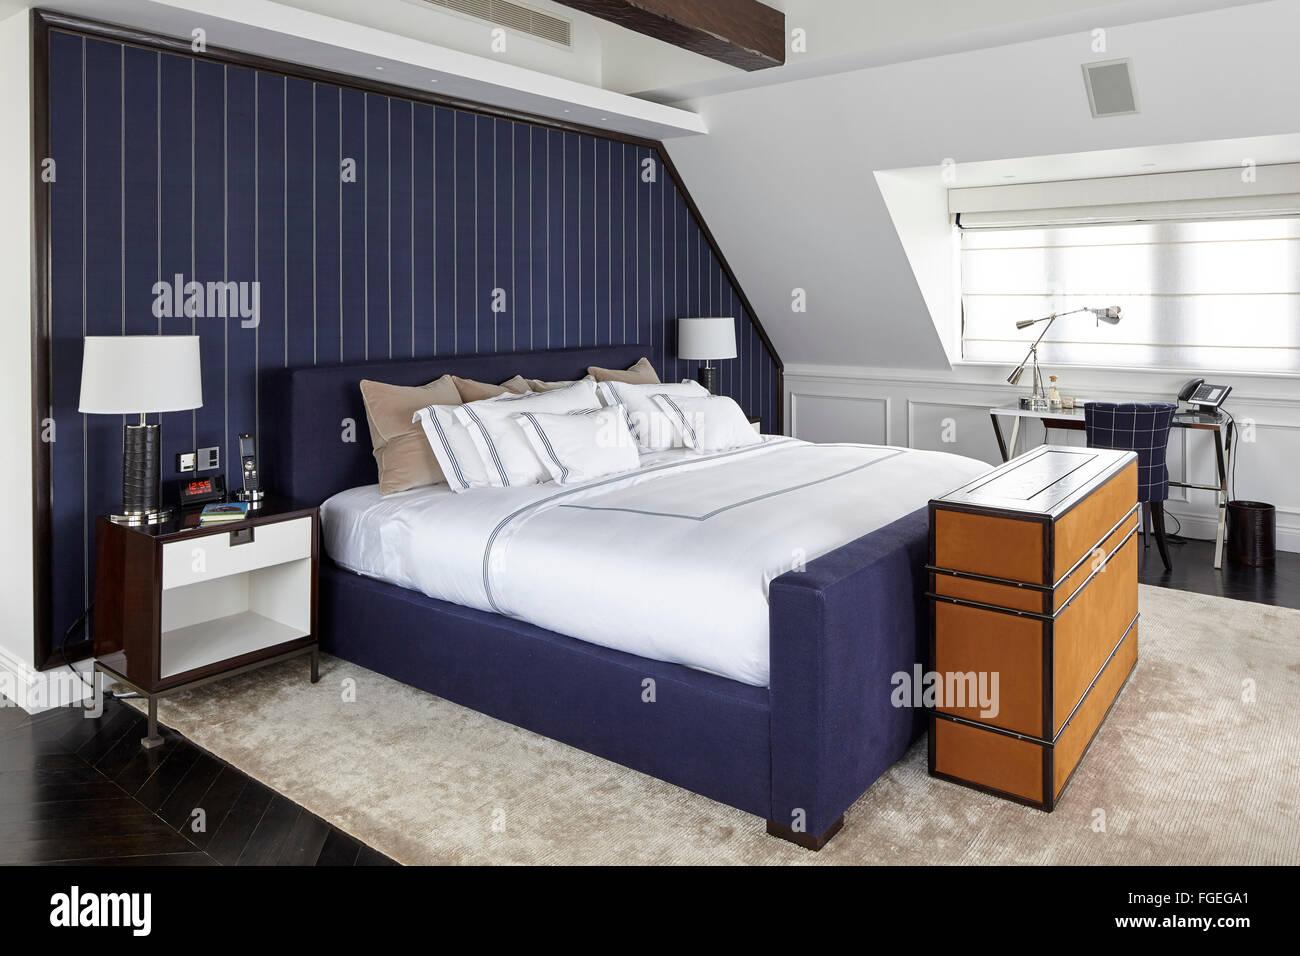 Chambre De Maître Avec Pinstripe Bleu Foncé Avec Revêtement Mural En